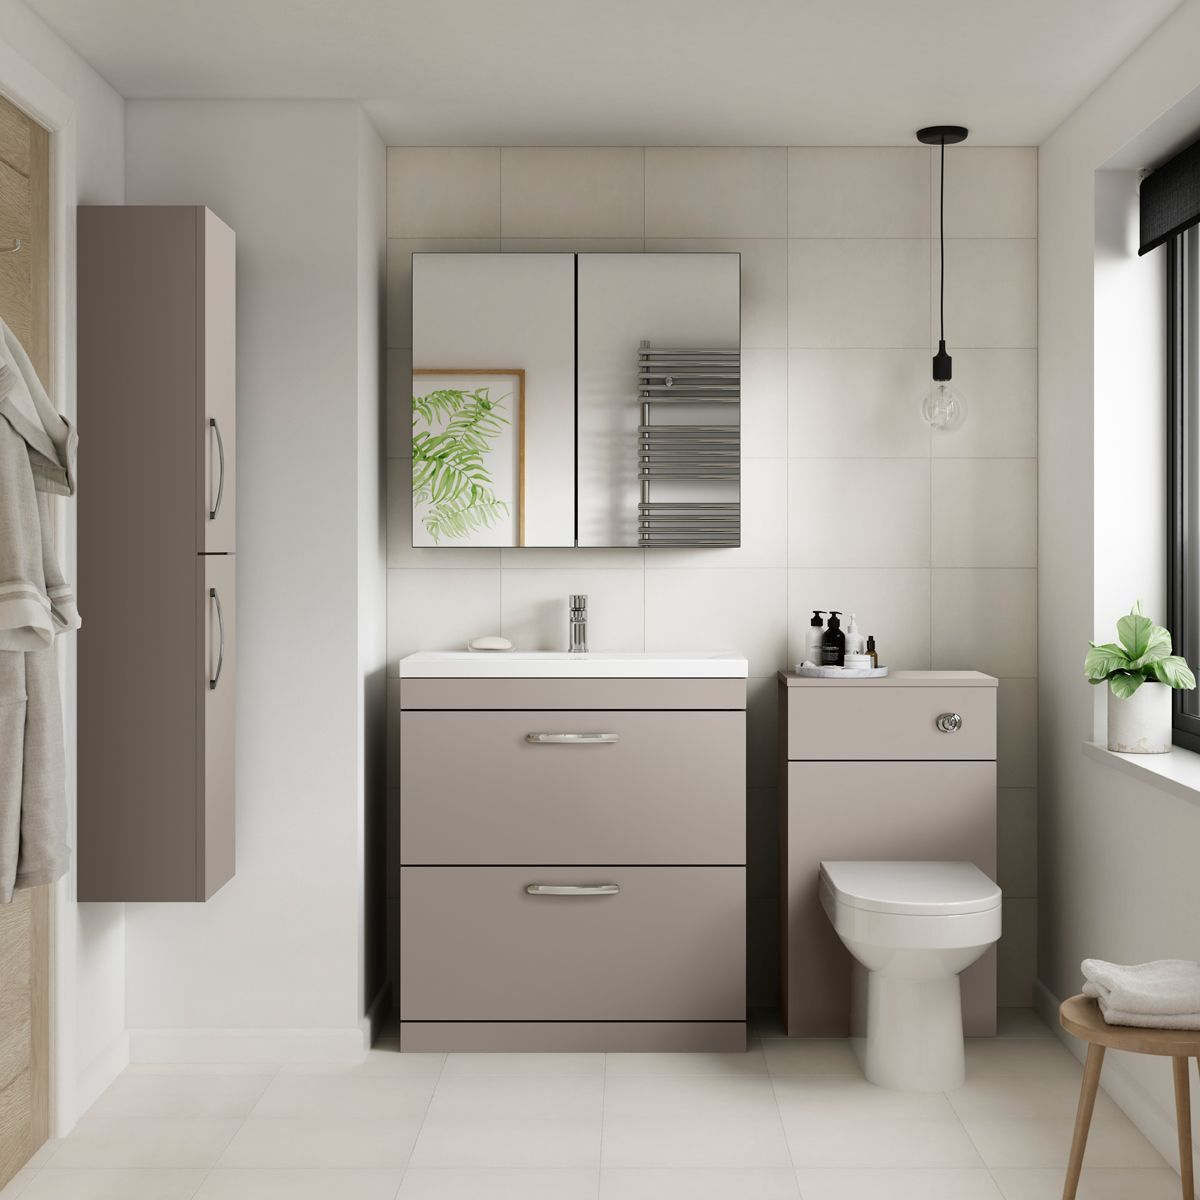 Premier Athena Stone Grey 2 Drawer Floor Standing Vanity Unit 800mm Lifestyle